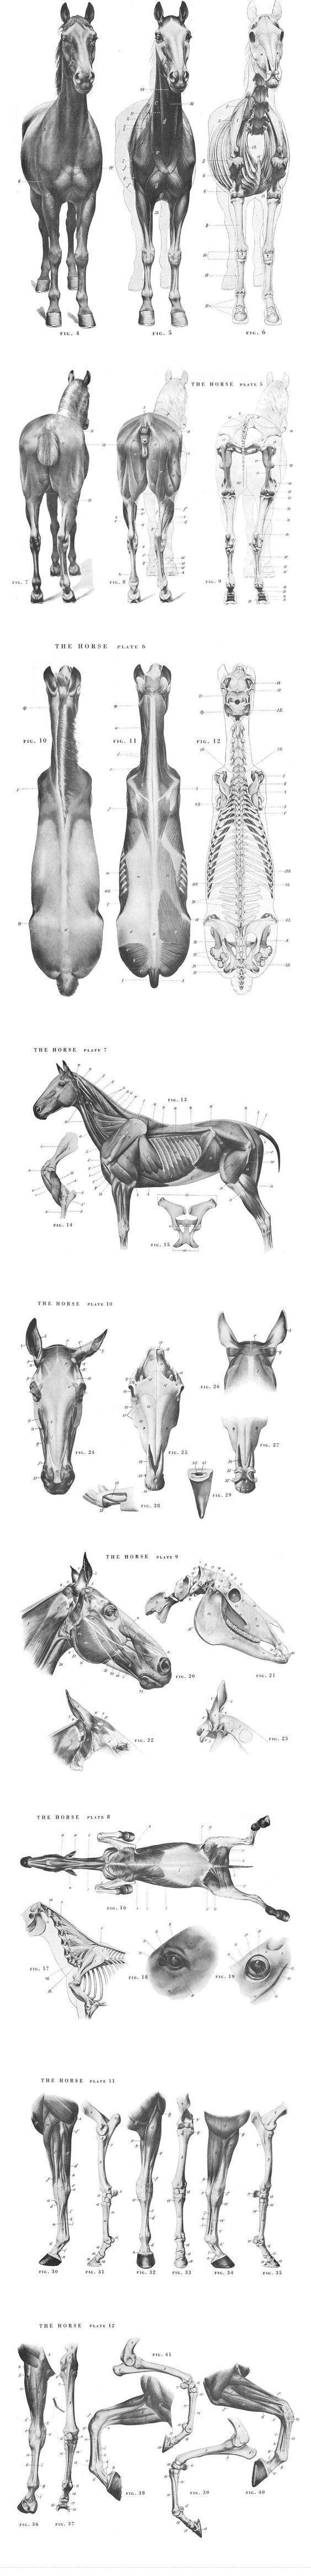 horse anatomy: | Vet someday | Pinterest | Horse anatomy, Horses and ...